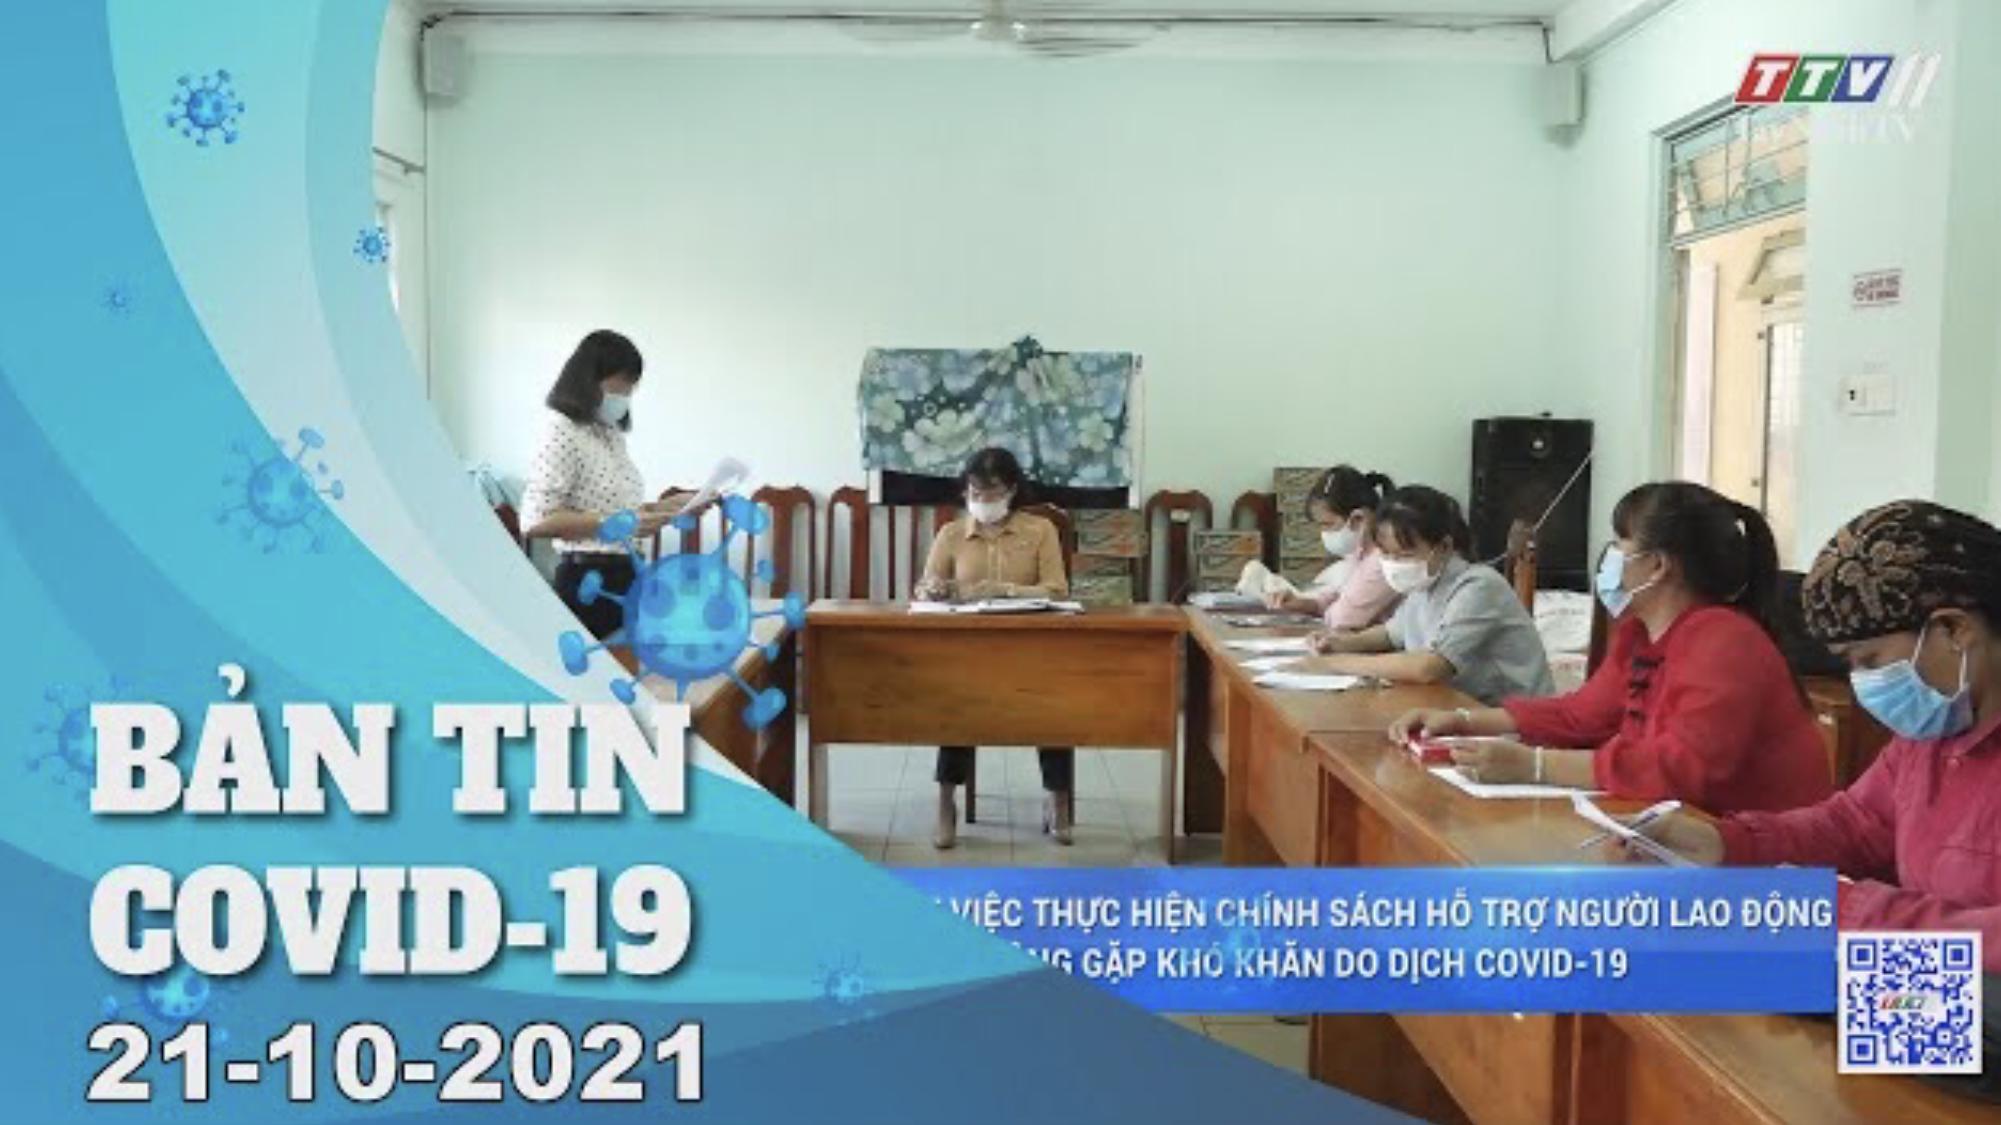 BẢN TIN COVID-19 21/10/2021 | Tin tức hôm nay | TayNinhTV